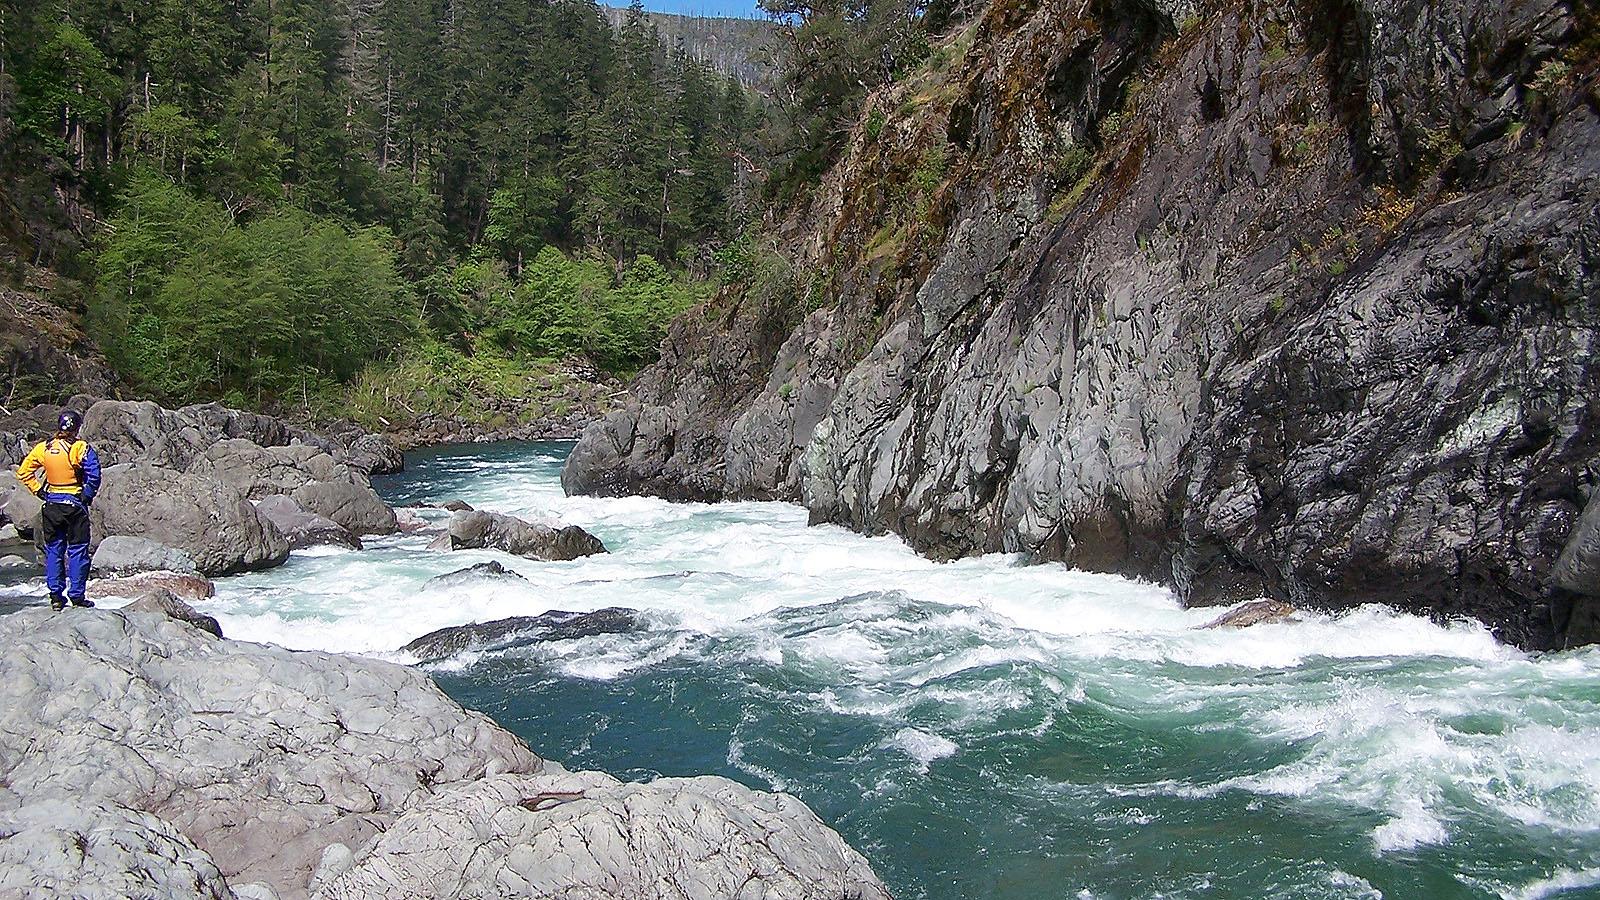 scouting-green-wall-rapid-illinois-river-arta-river-trips-h-web